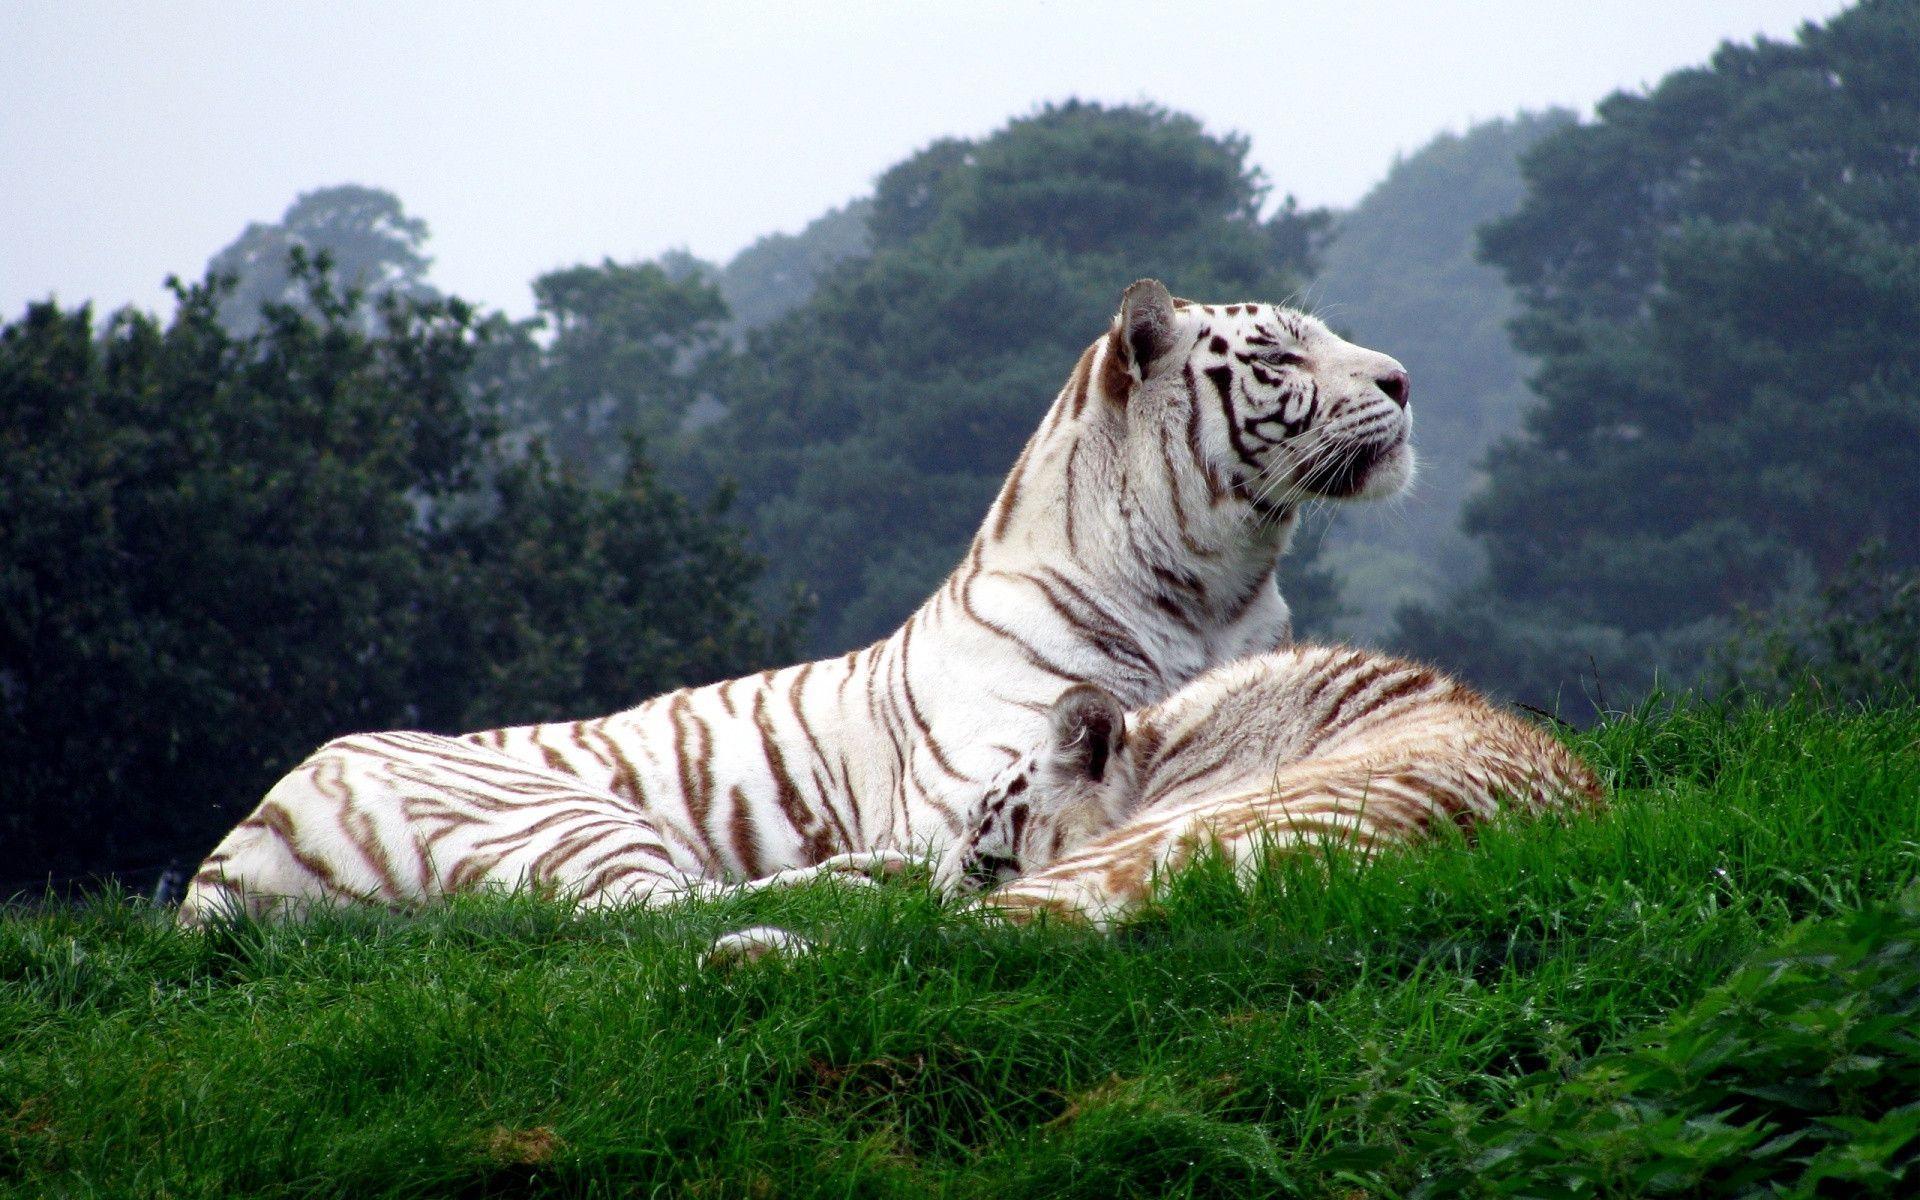 tiger wallpaper widescreen - photo #7